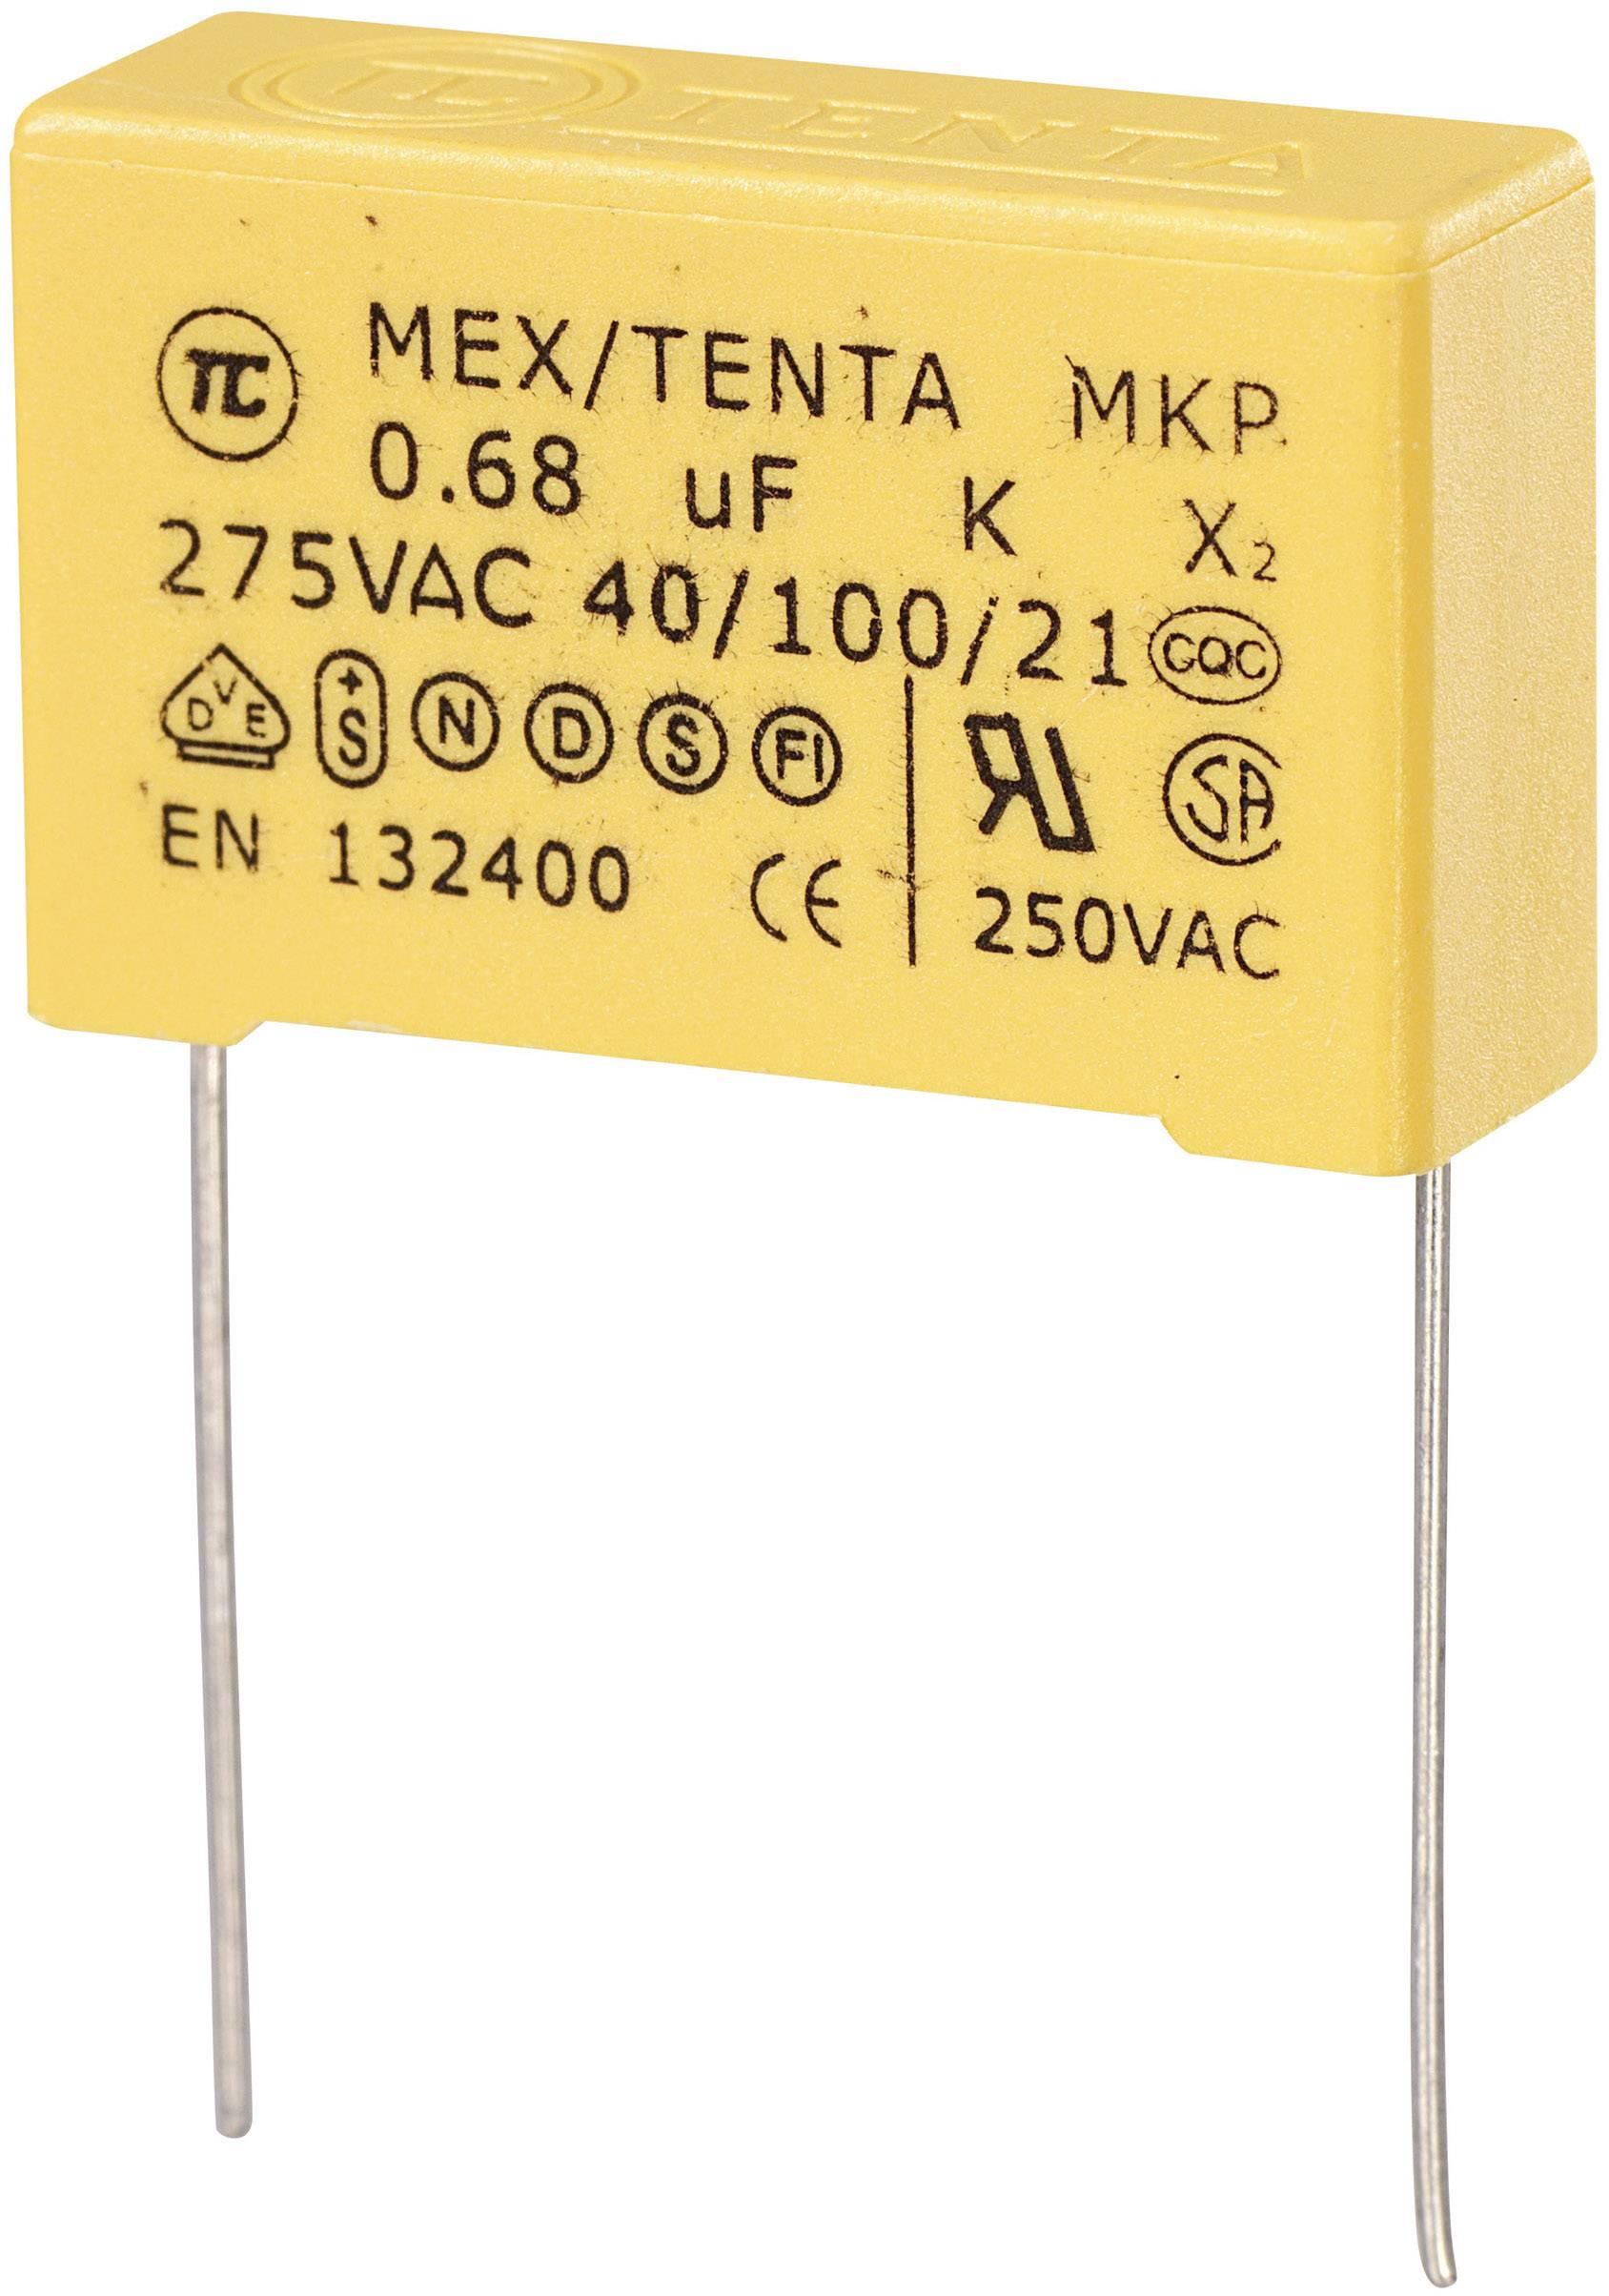 Foliový kondenzátor MKP, 0,68 µF, X2 275 V/AC, 10 %, 30 x 11 x 20 mm